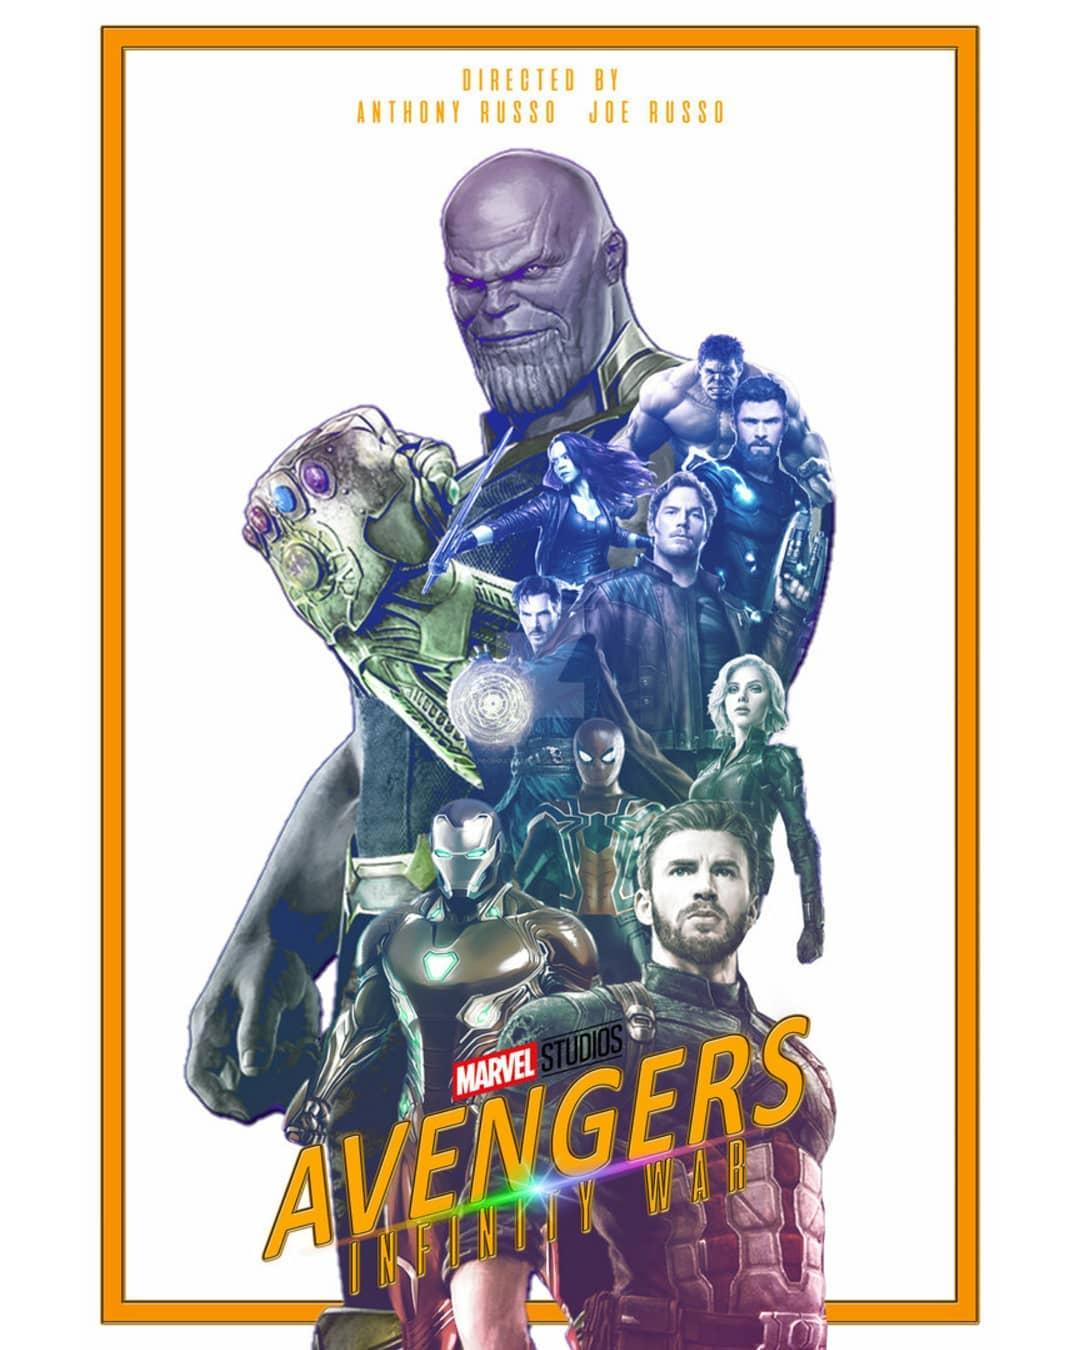 Avengers: Infinity War Poster Design on Inspirationde